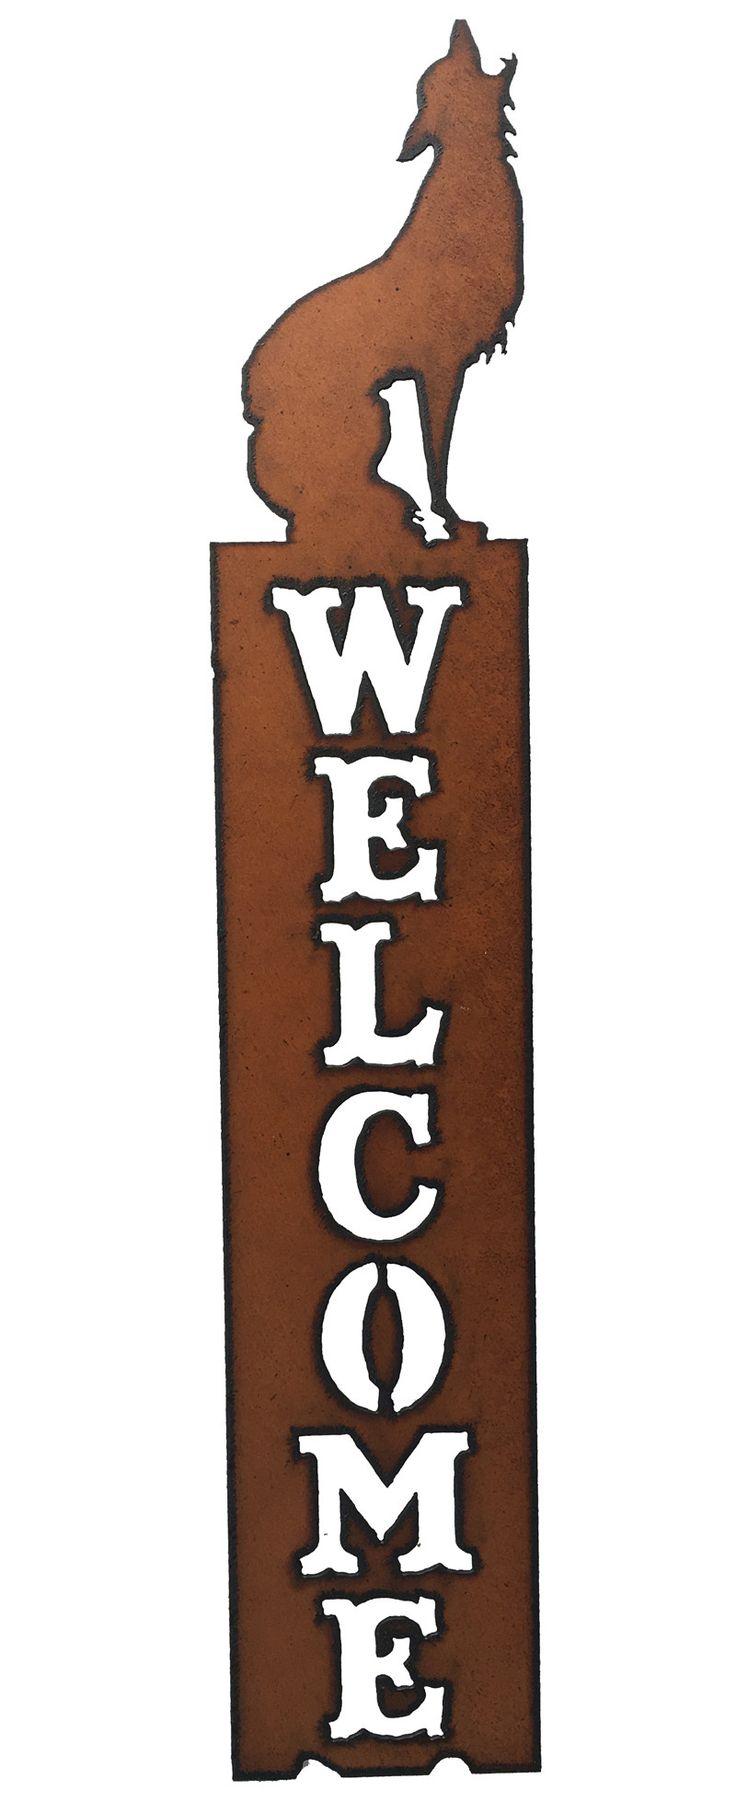 Rustic Metal Coyote Southwestern Home Decor Vertical Welcome Sign Front Door Welcome